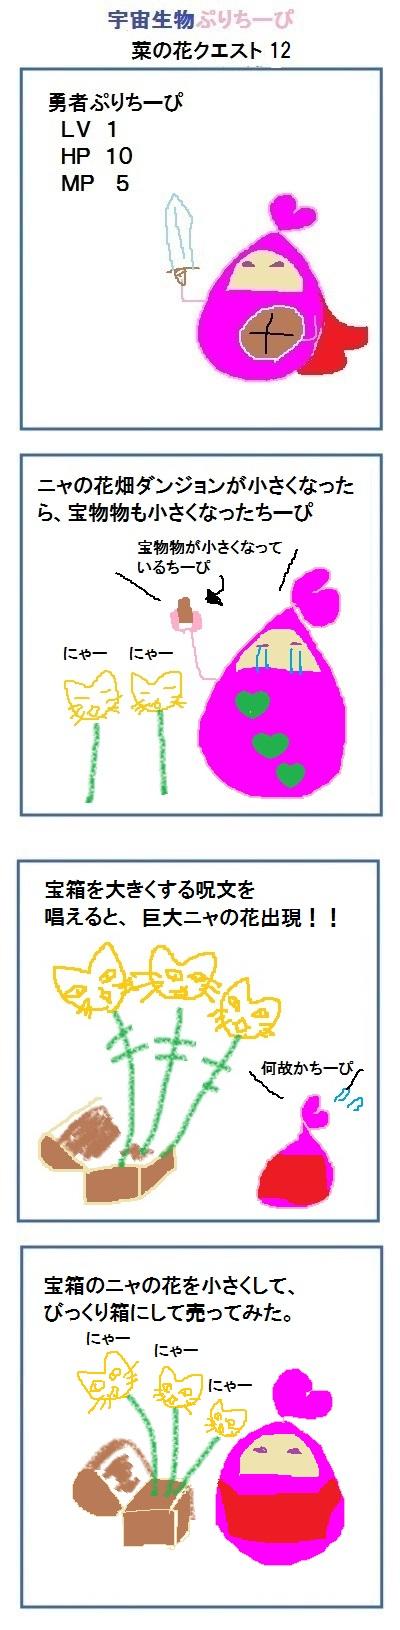 160325_nanohana_quest12.jpg